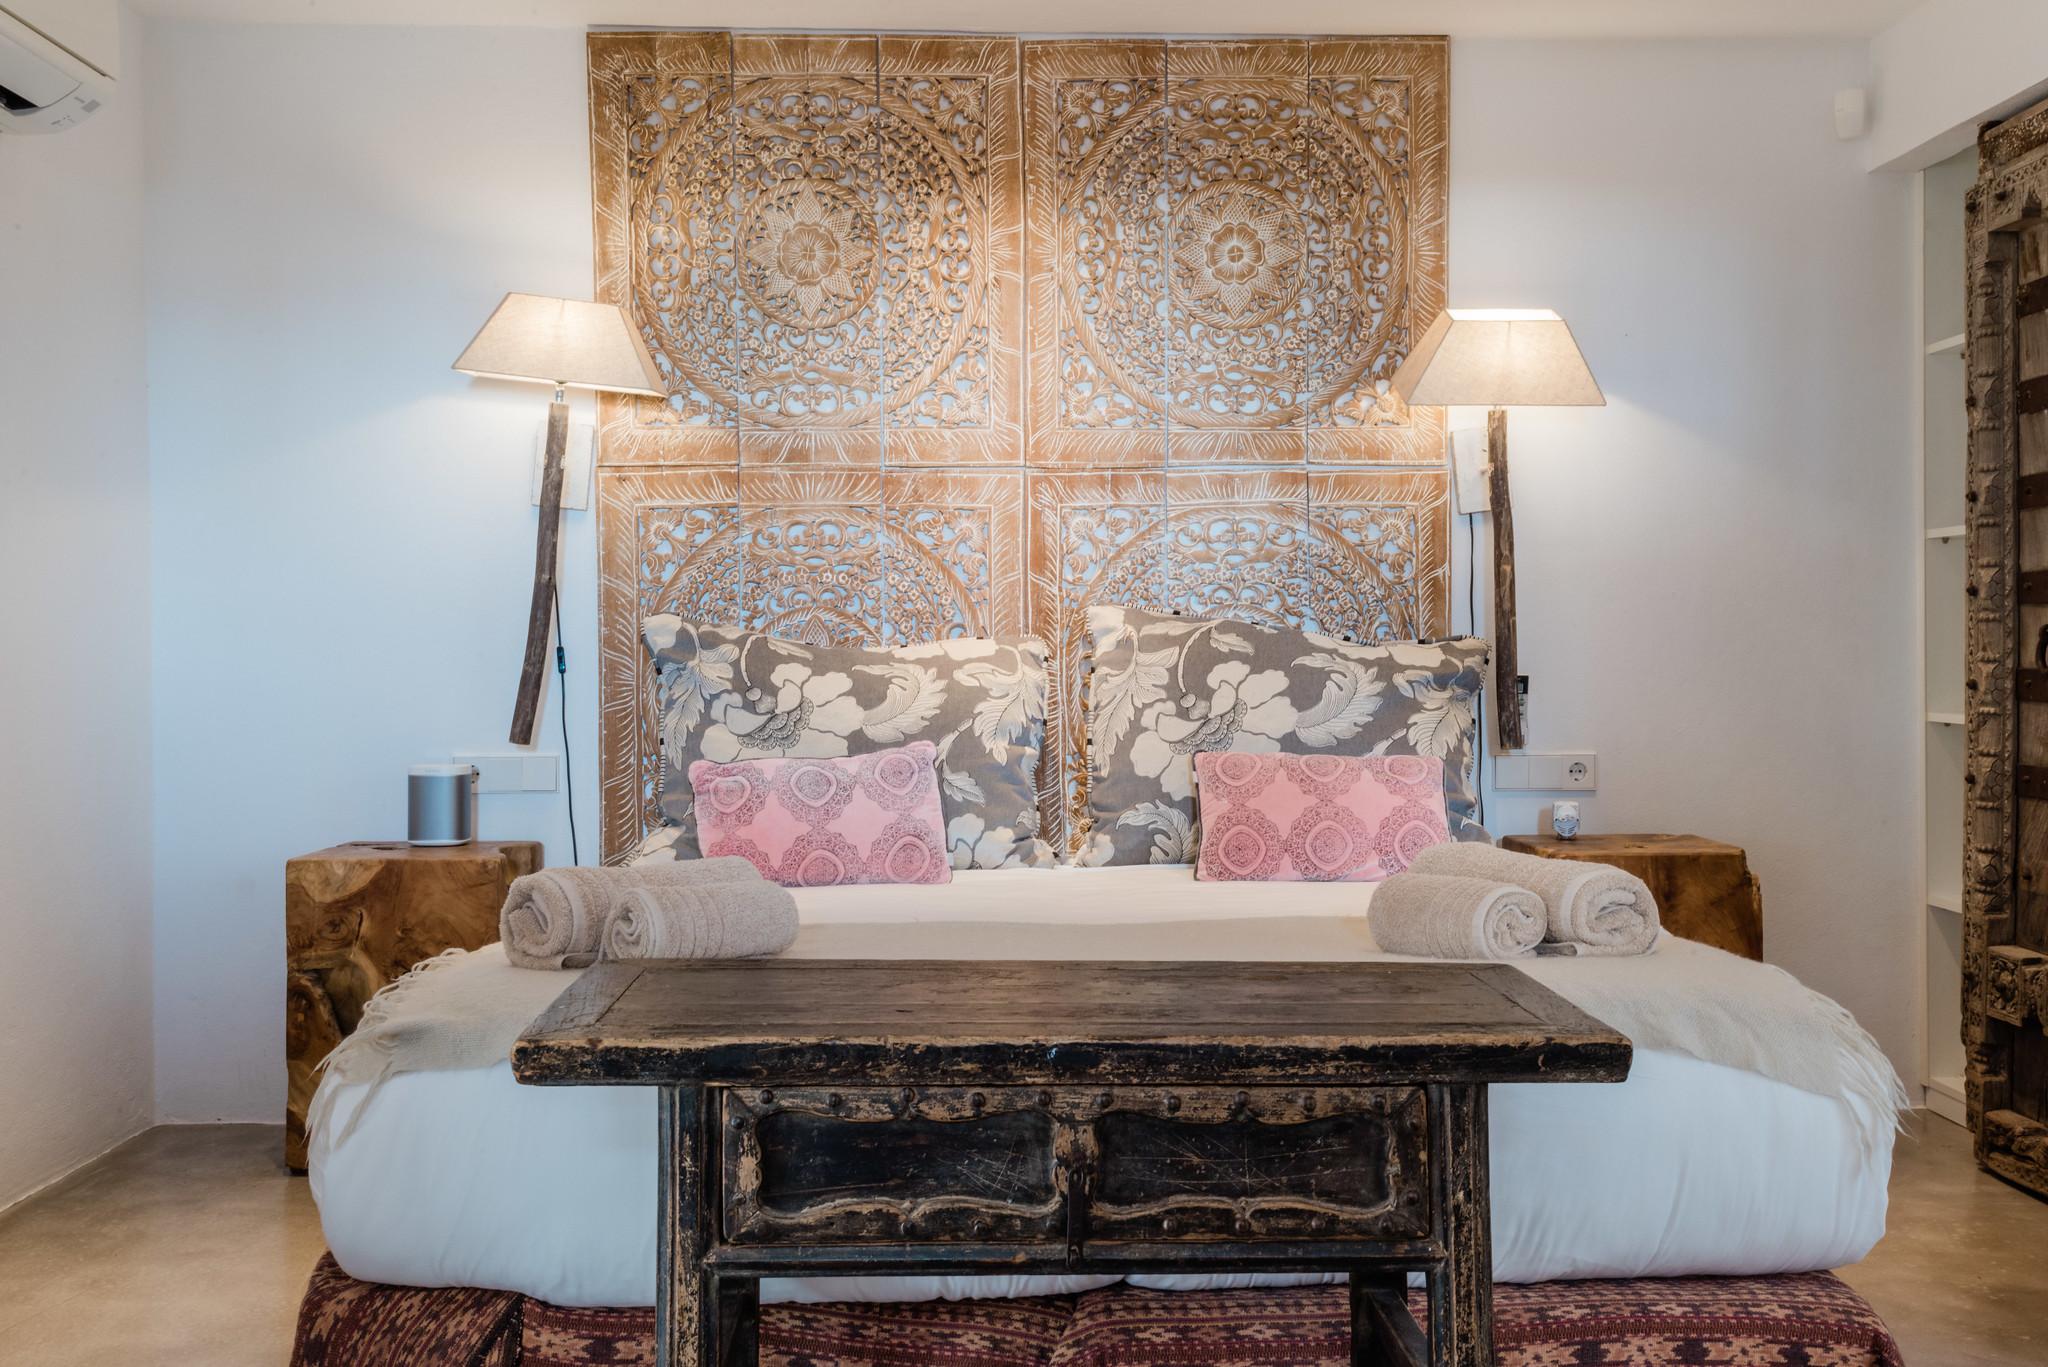 https://www.white-ibiza.com/wp-content/uploads/2020/05/white-ibiza-villas-casa-amalia-interior-bedroom2-1.jpg